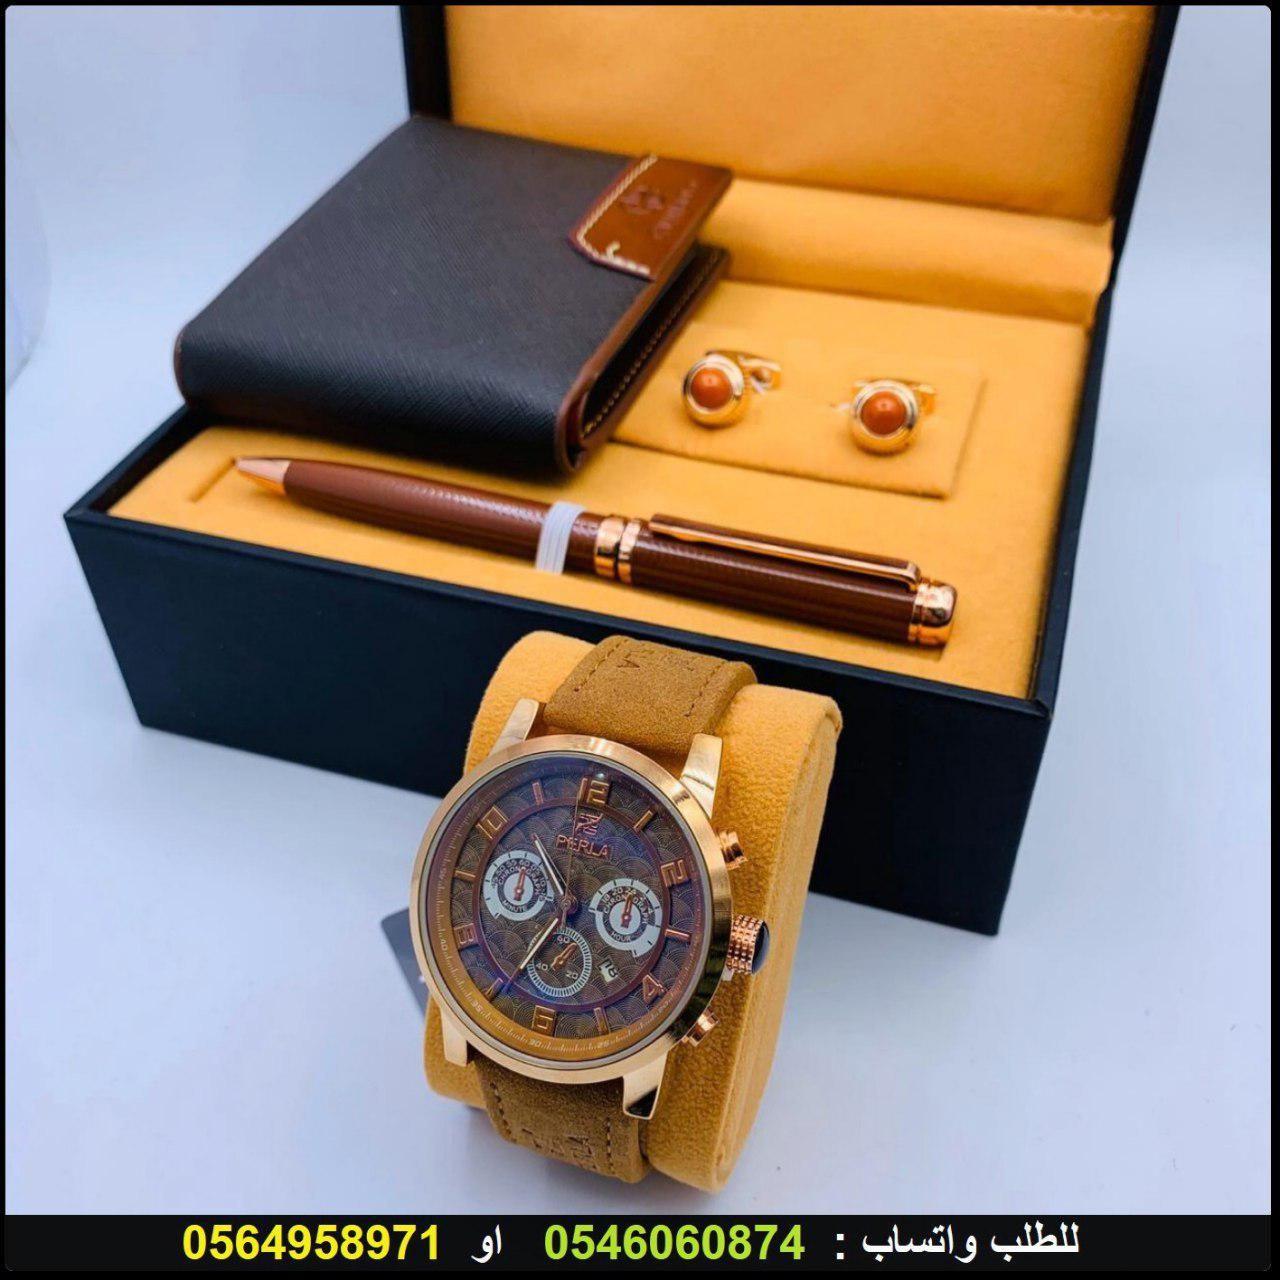 ساعات رجاليه 2020 طقم فخم مع سواره و قلم وكبك وعلبة فخمه هدايا هنوف Leather Watch Leather Accessories